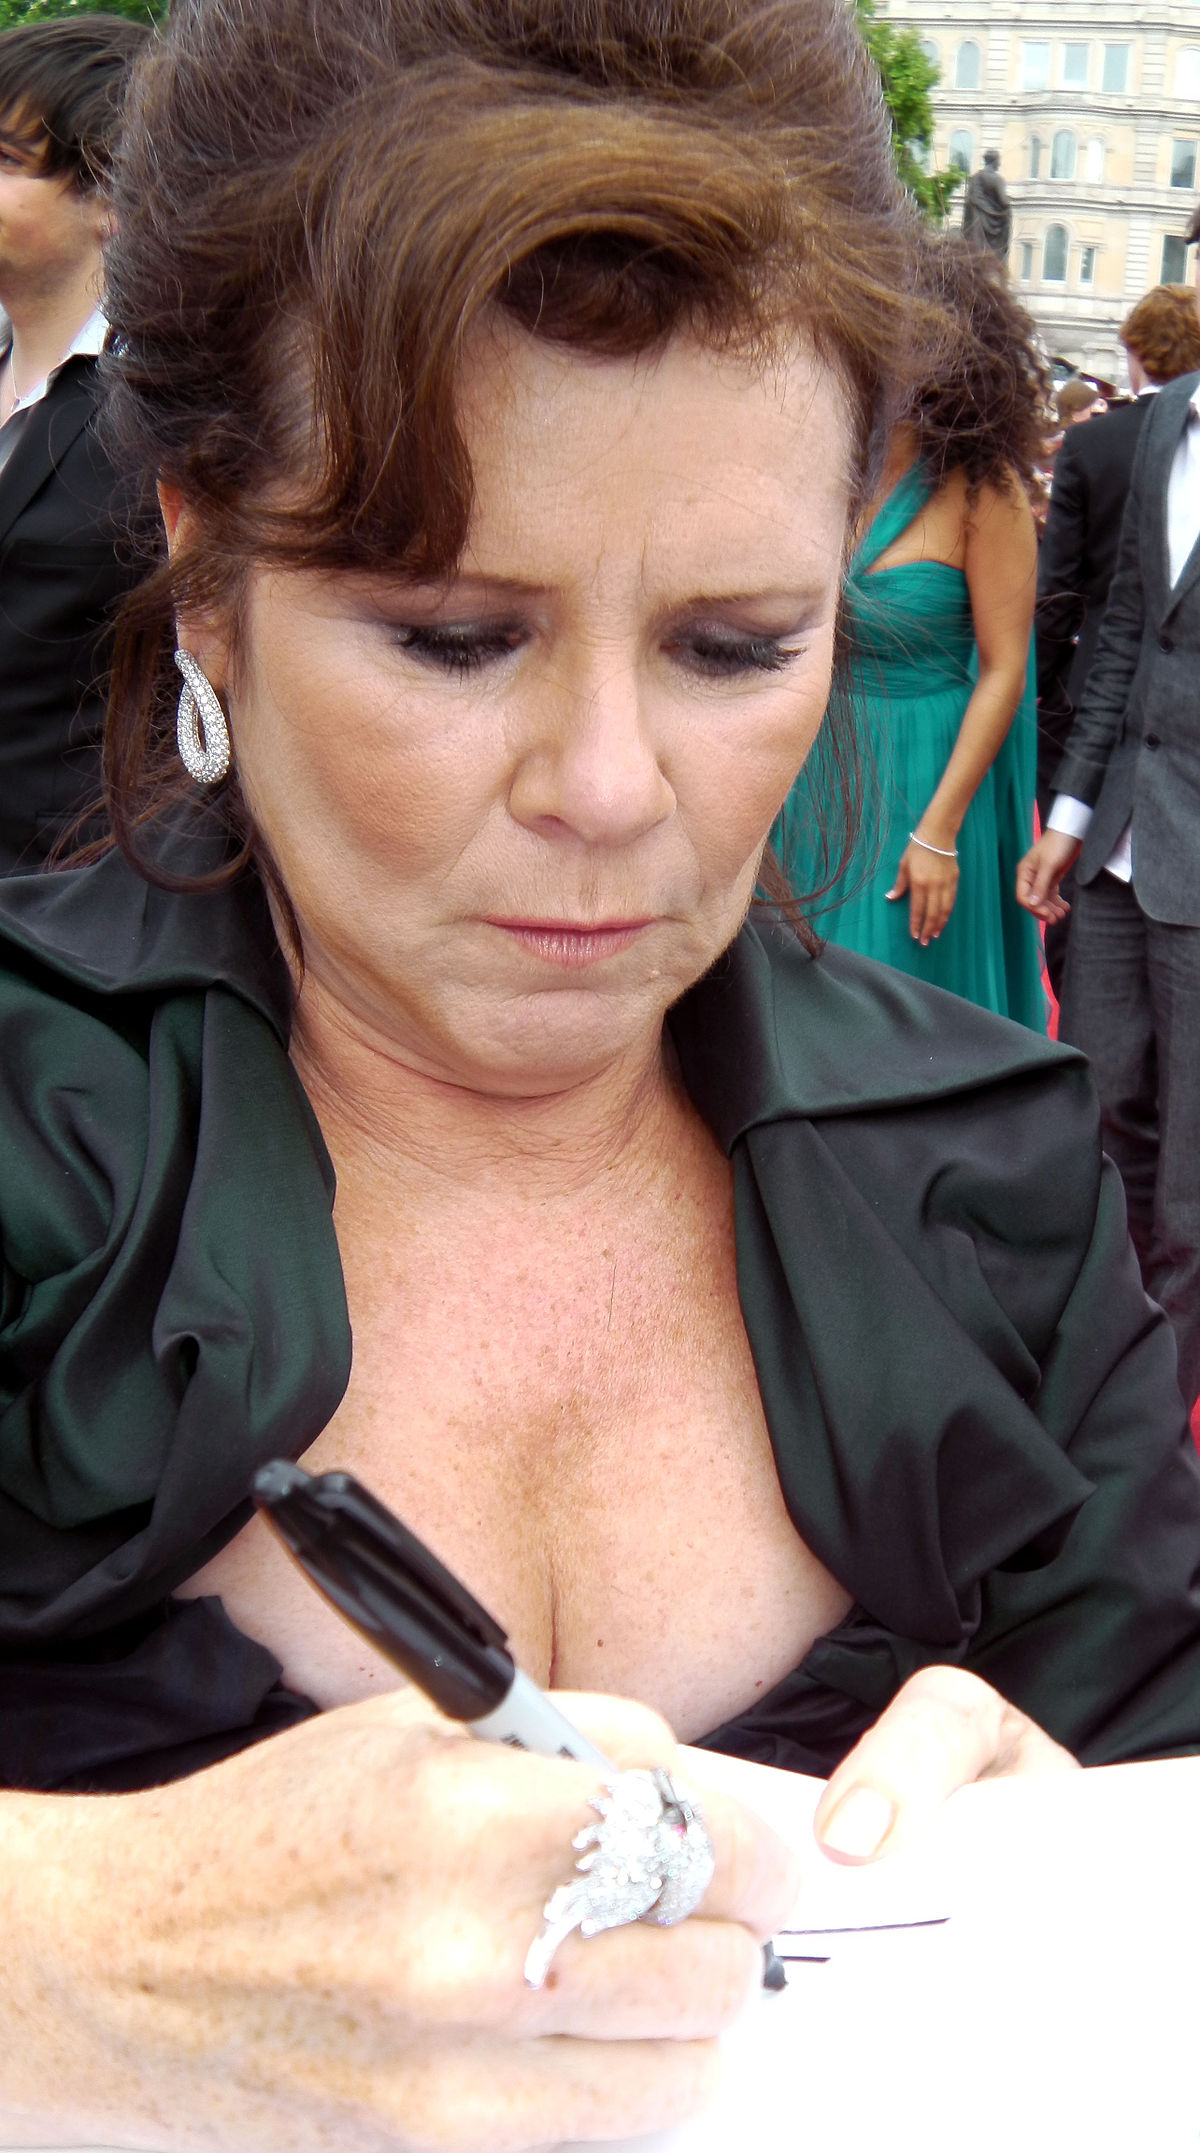 Imelda Staunton (born 1956)